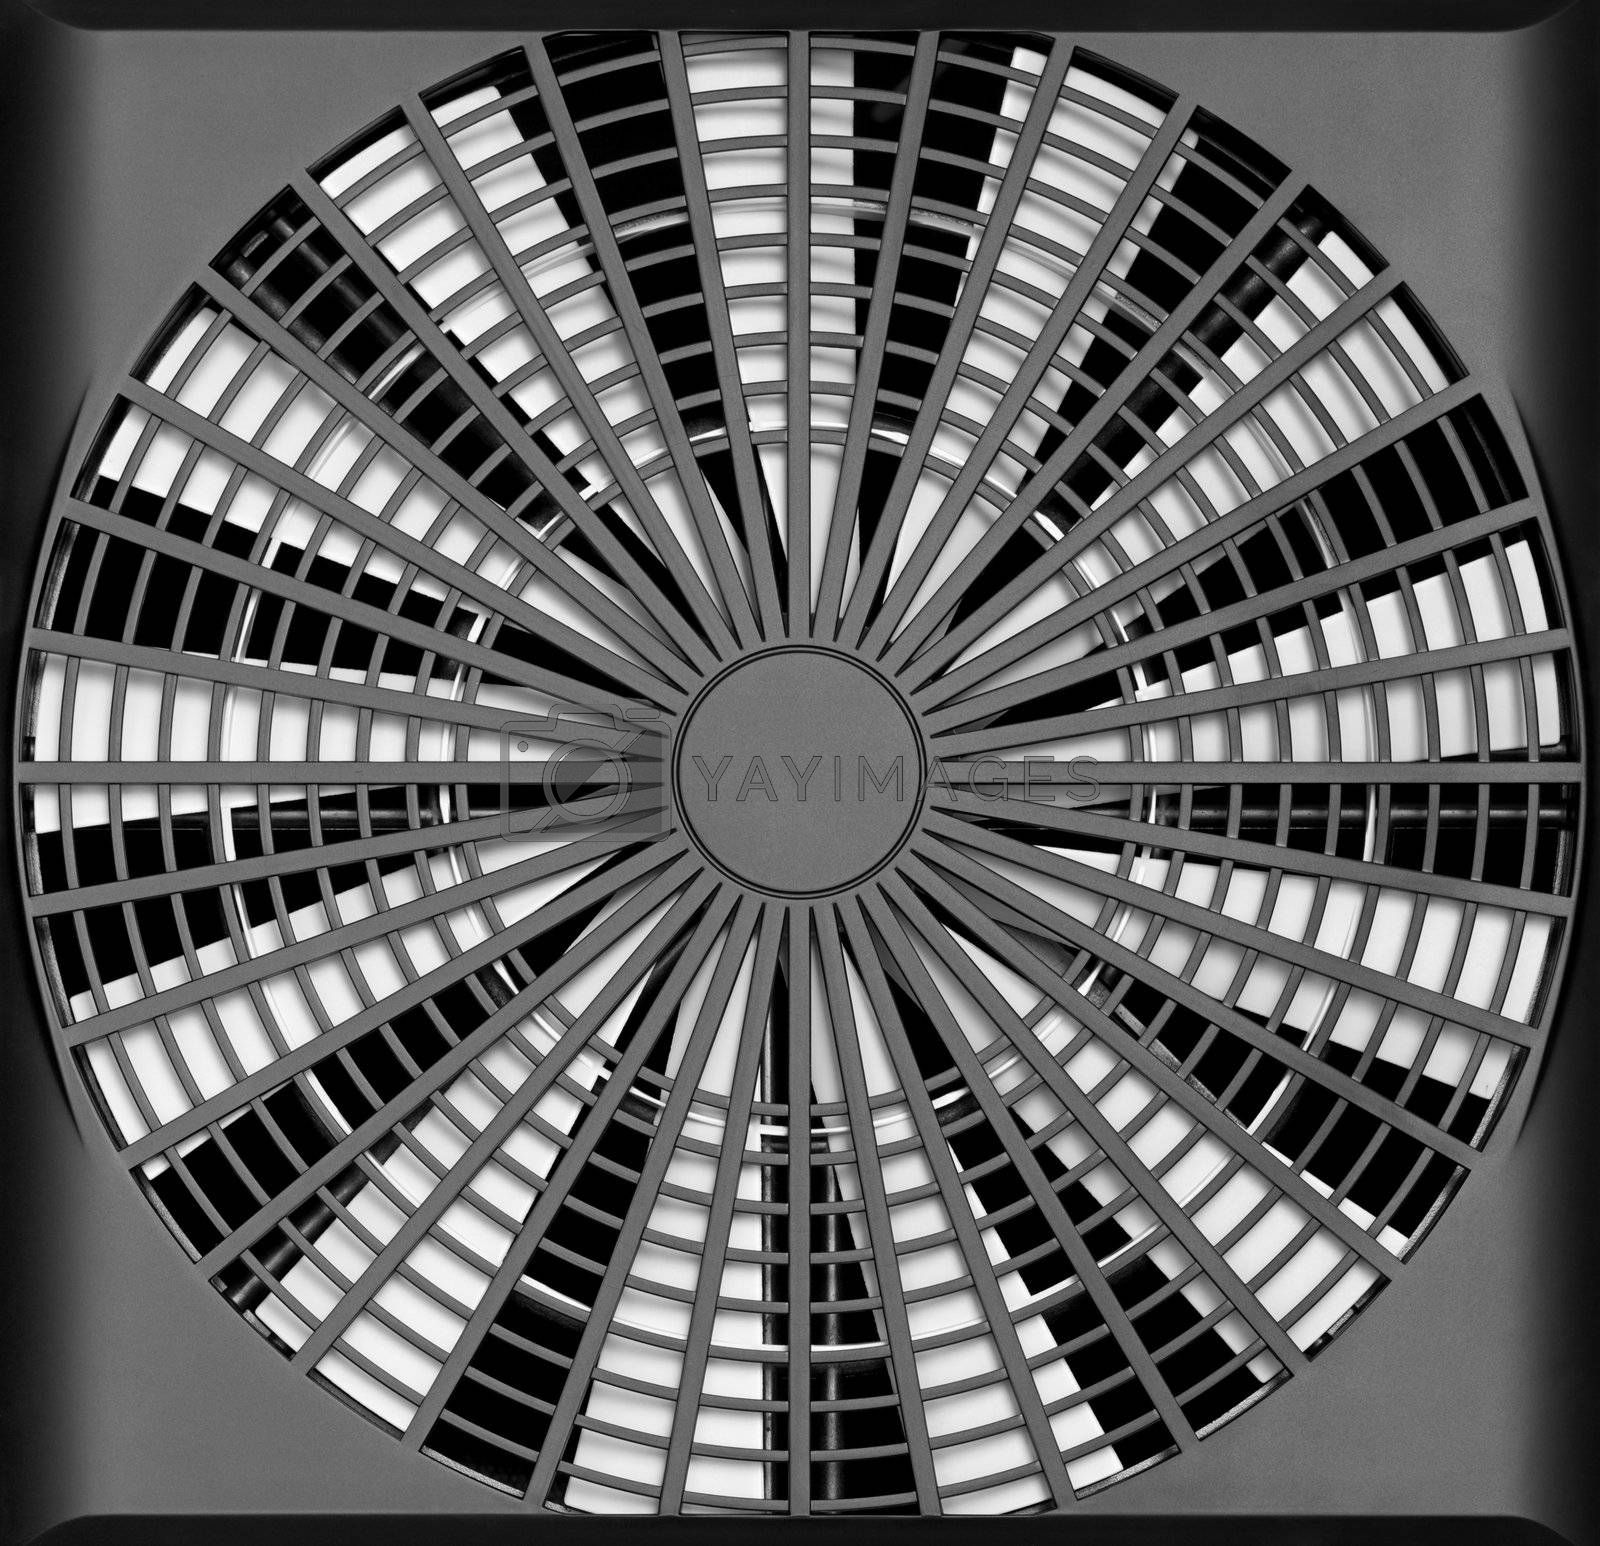 An industrial ventilation fan - turbine air-compressor